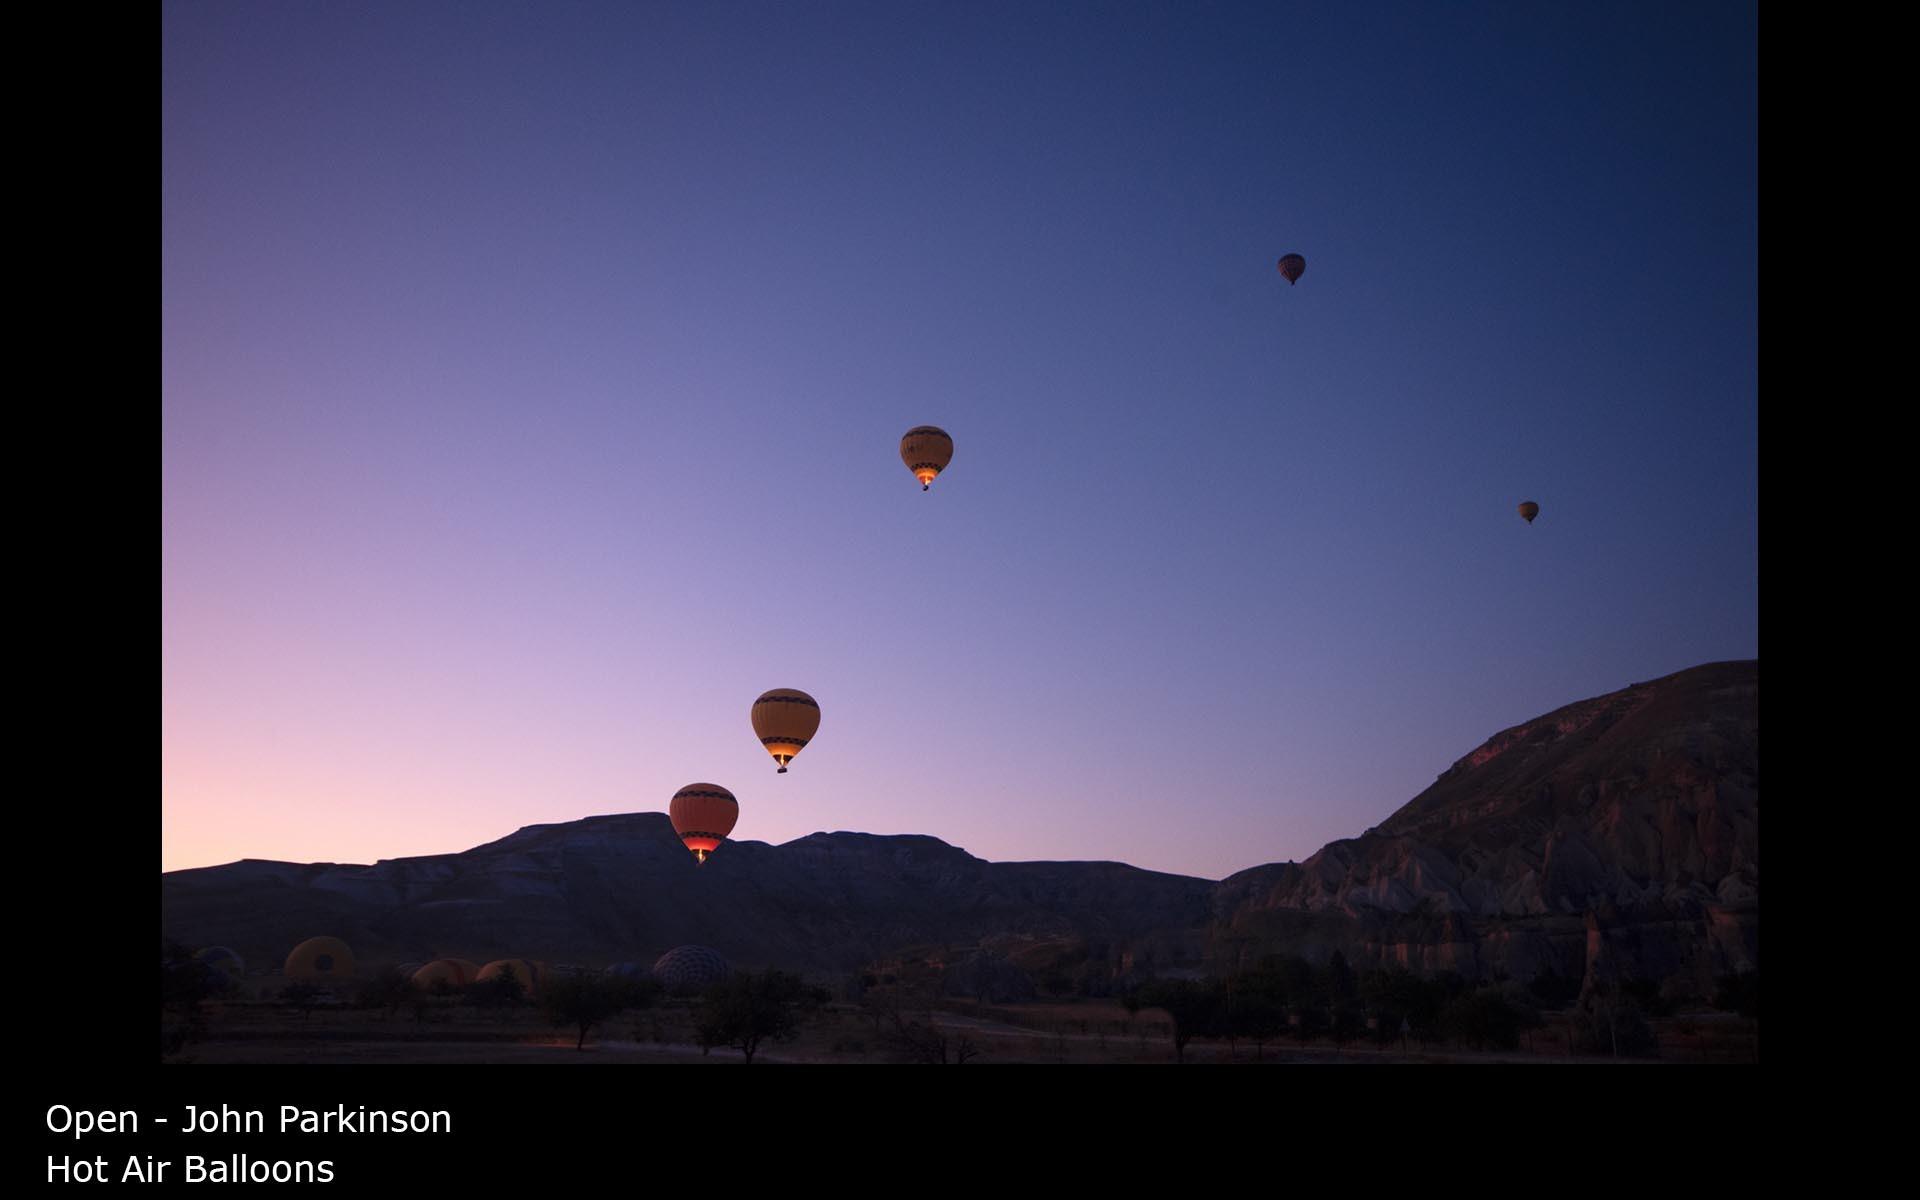 Hot Air Balloons - John Parkinson